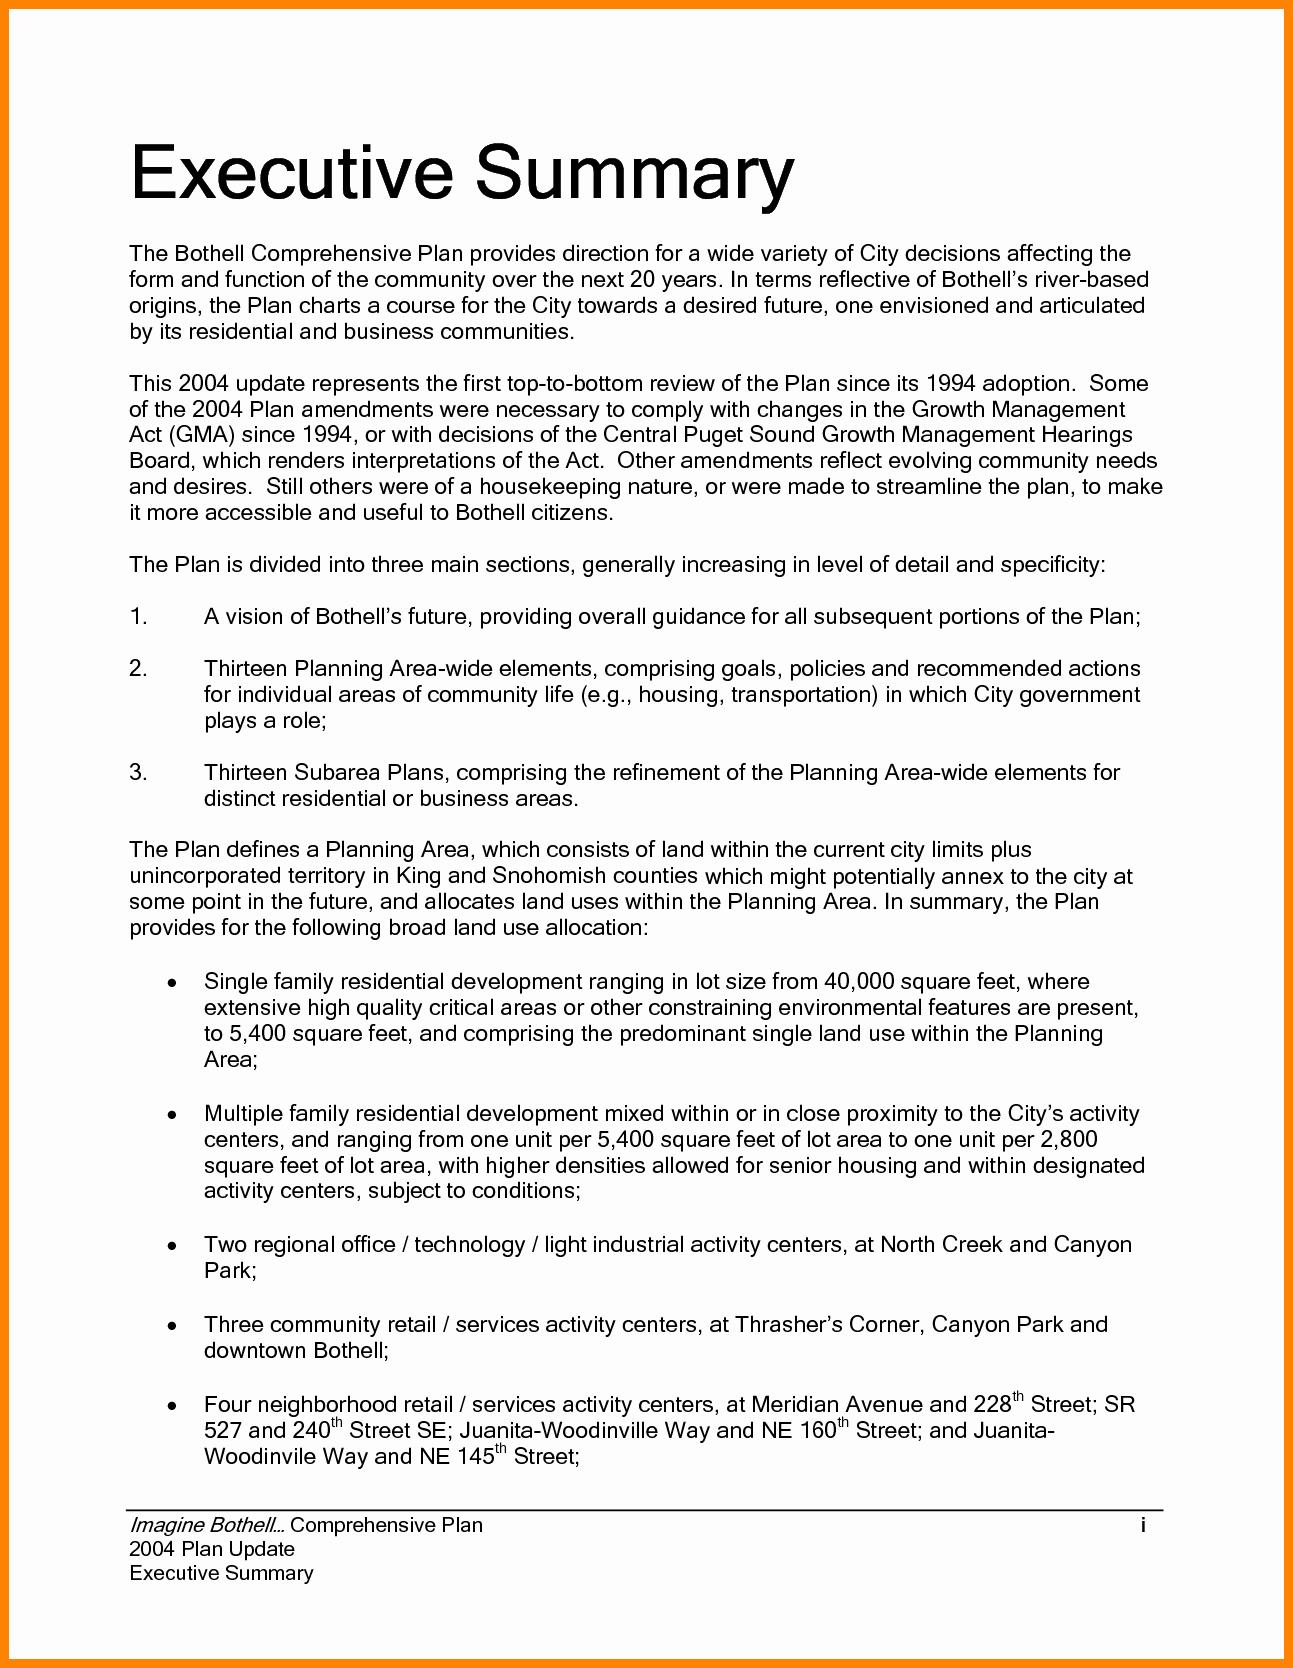 Executive Summary Marketing Plan Beautiful 9 Executive Summary Marketing Plan Examples Pdf Word